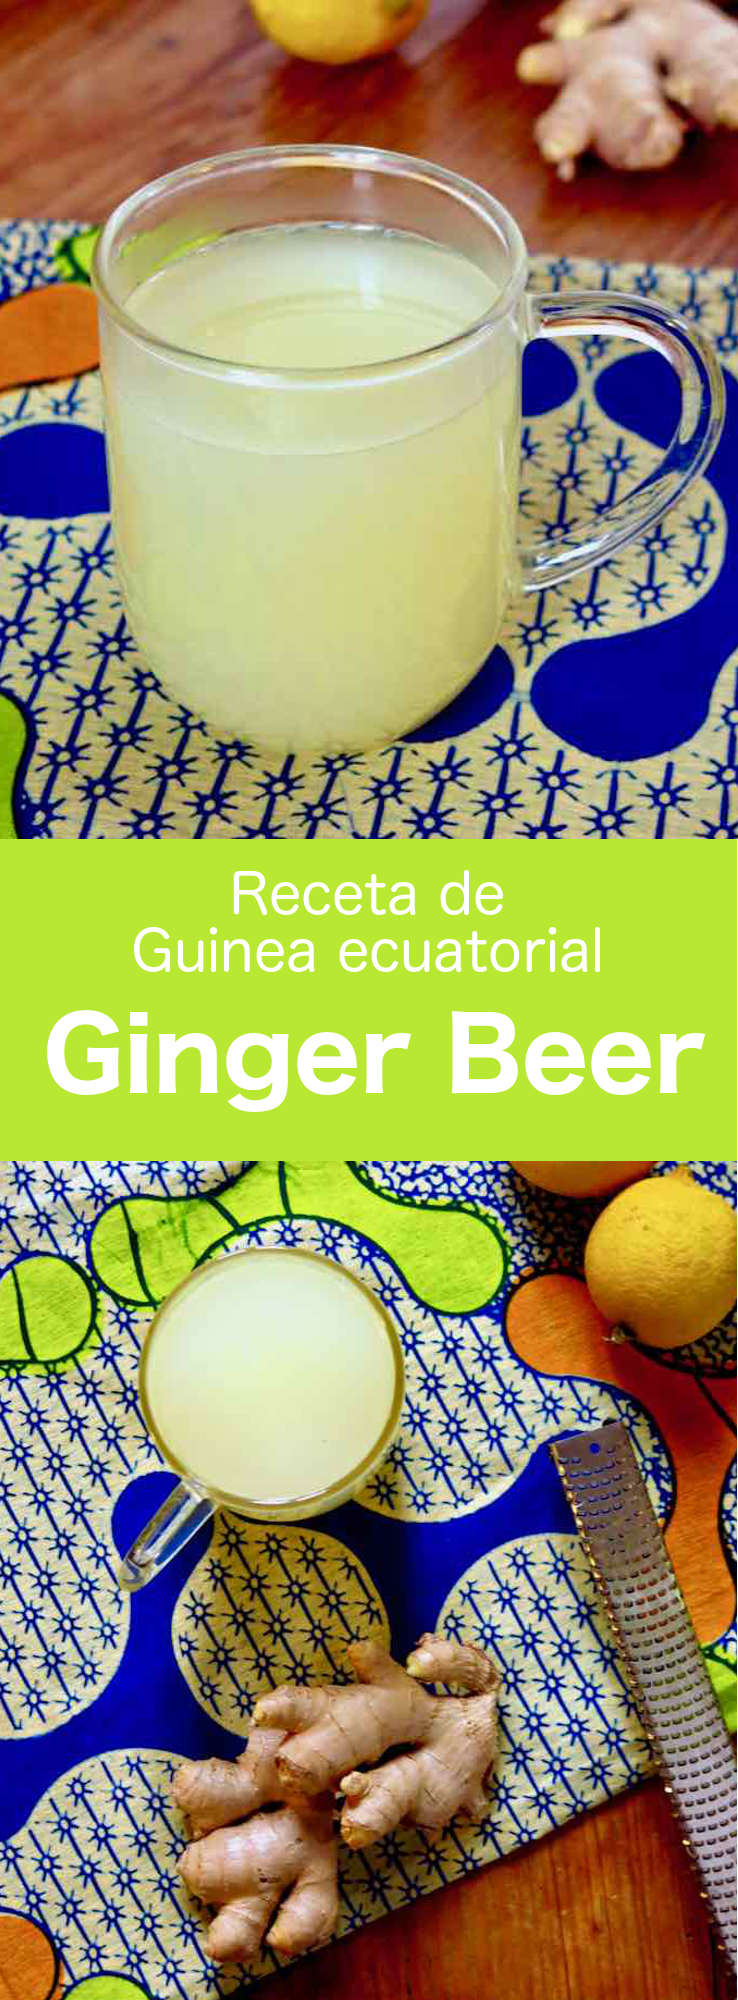 La cerveza ginja (cerveza de jengibre) es una bebida carbonatada sin alcohol que se produce a través de la fermentación natural del jengibre, la levadura y el azúcar.